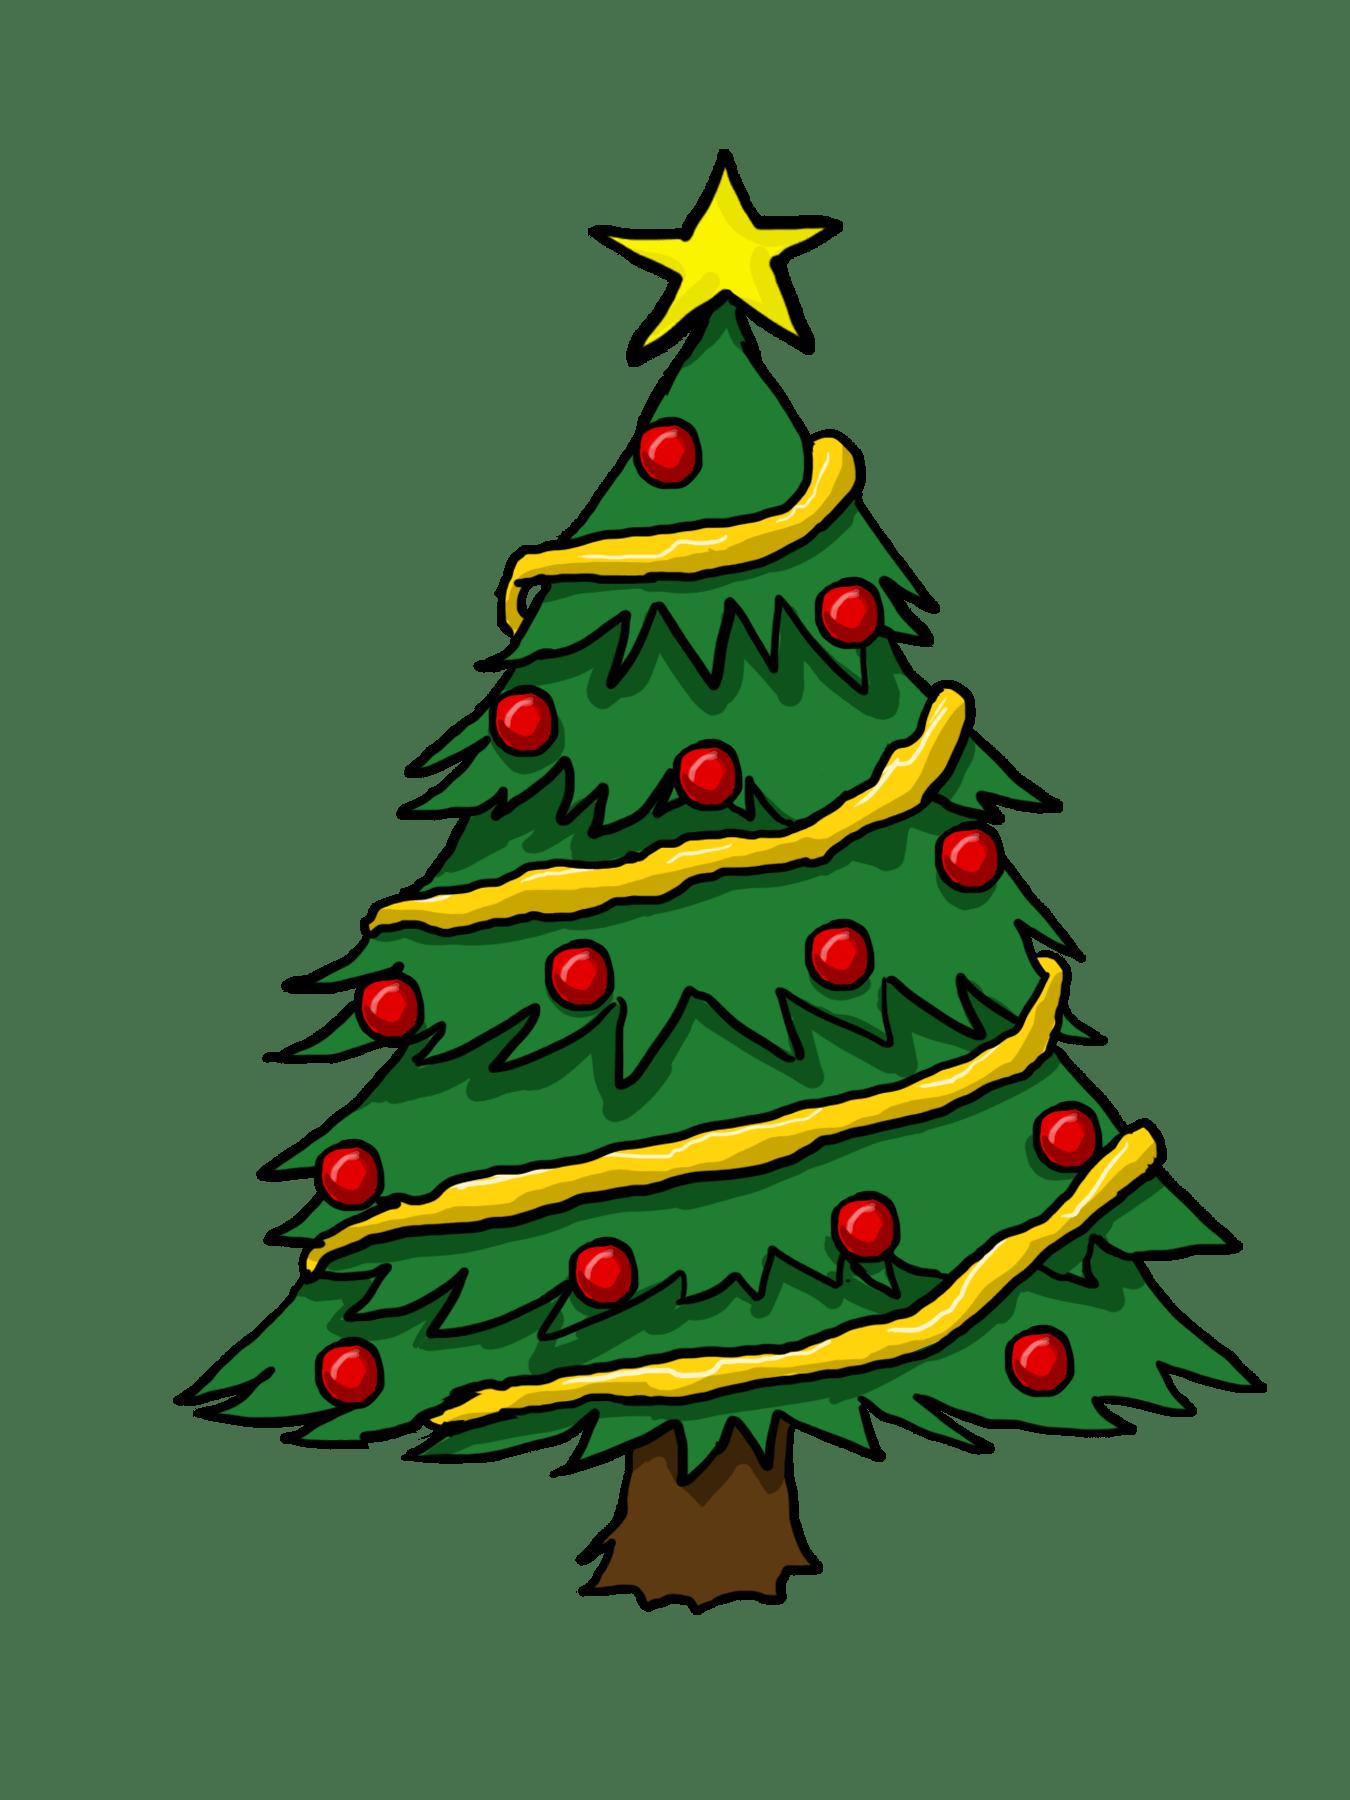 hight resolution of free christmas tree clip art borders